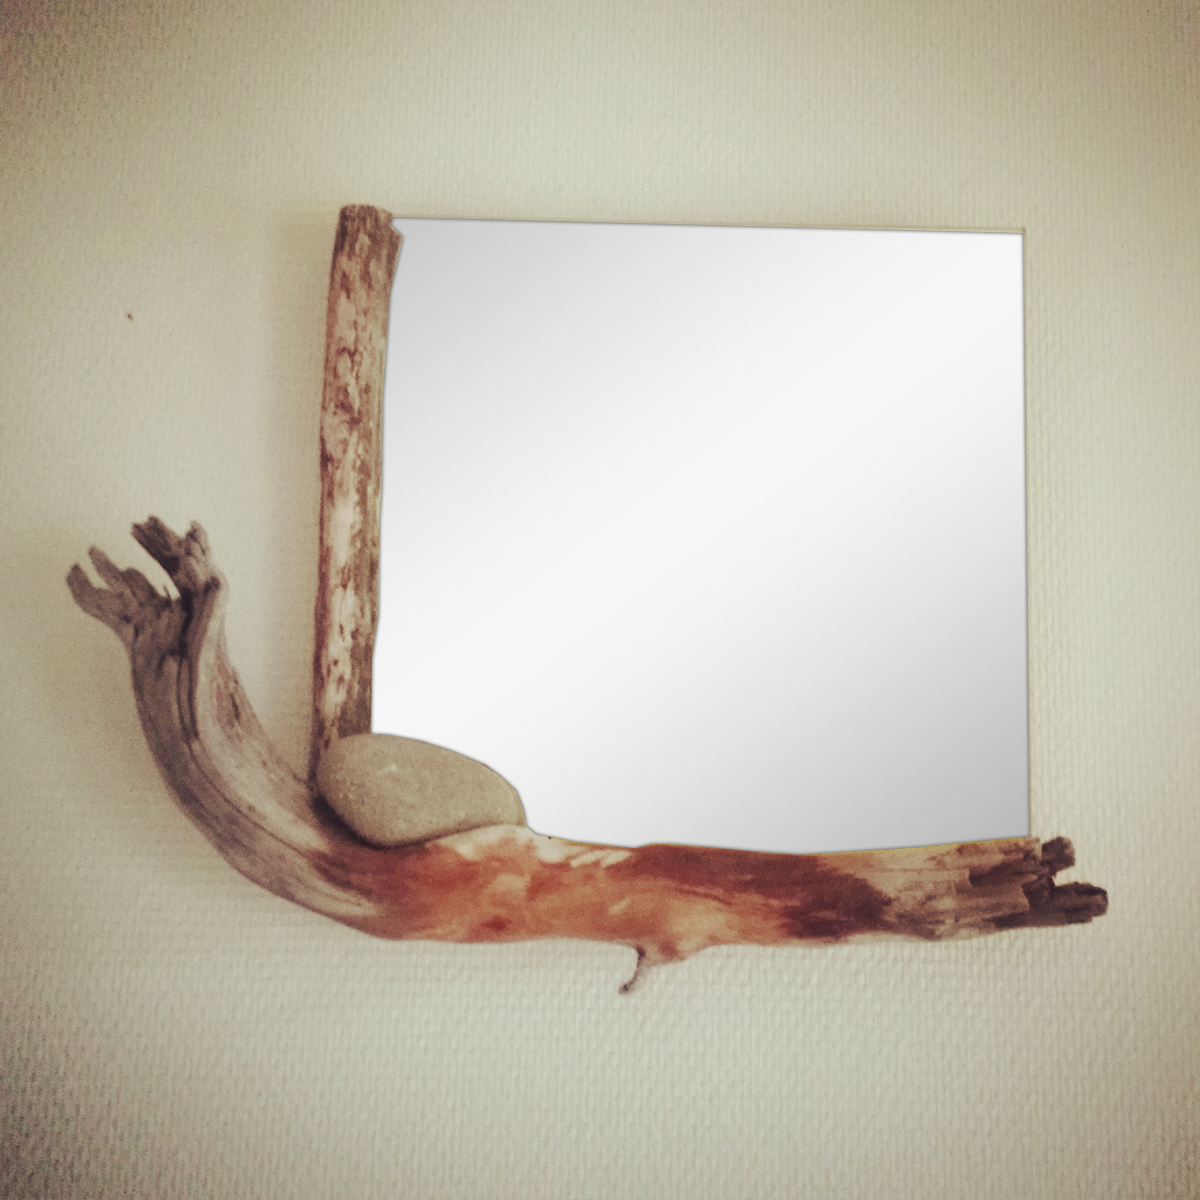 Miroir bois flott art by ze studio annecy cr ations for Miroir cadre bois flotte